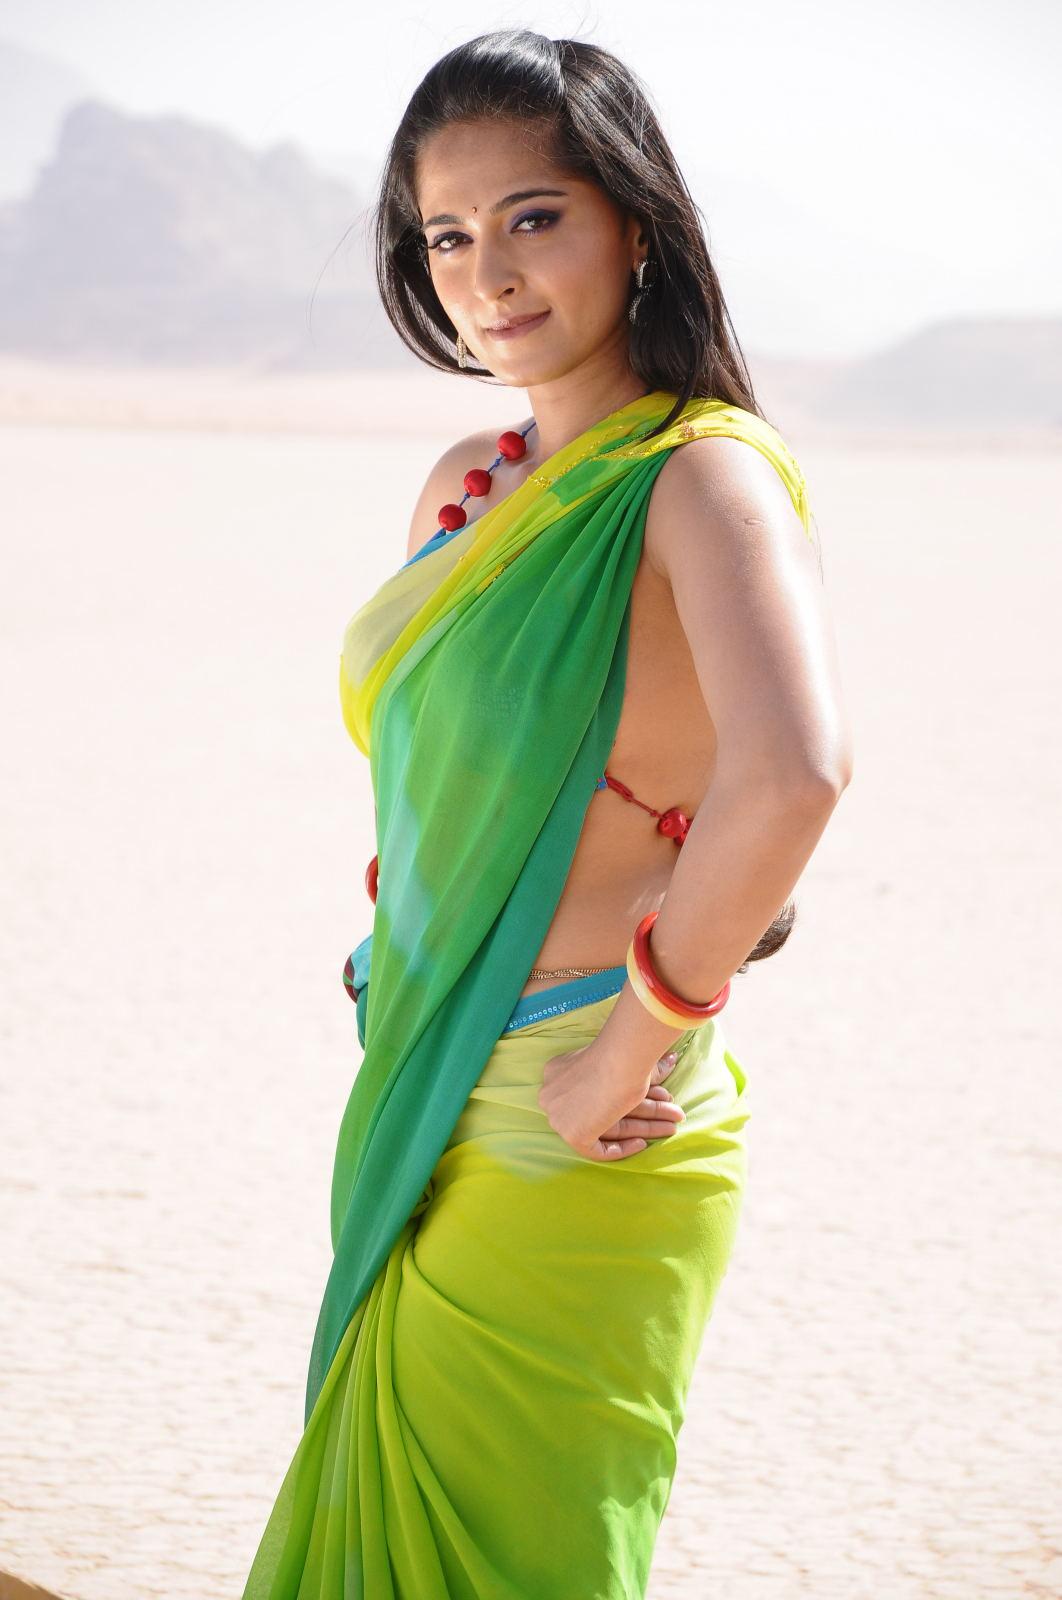 The phrase Anushka shetty hot in bra are